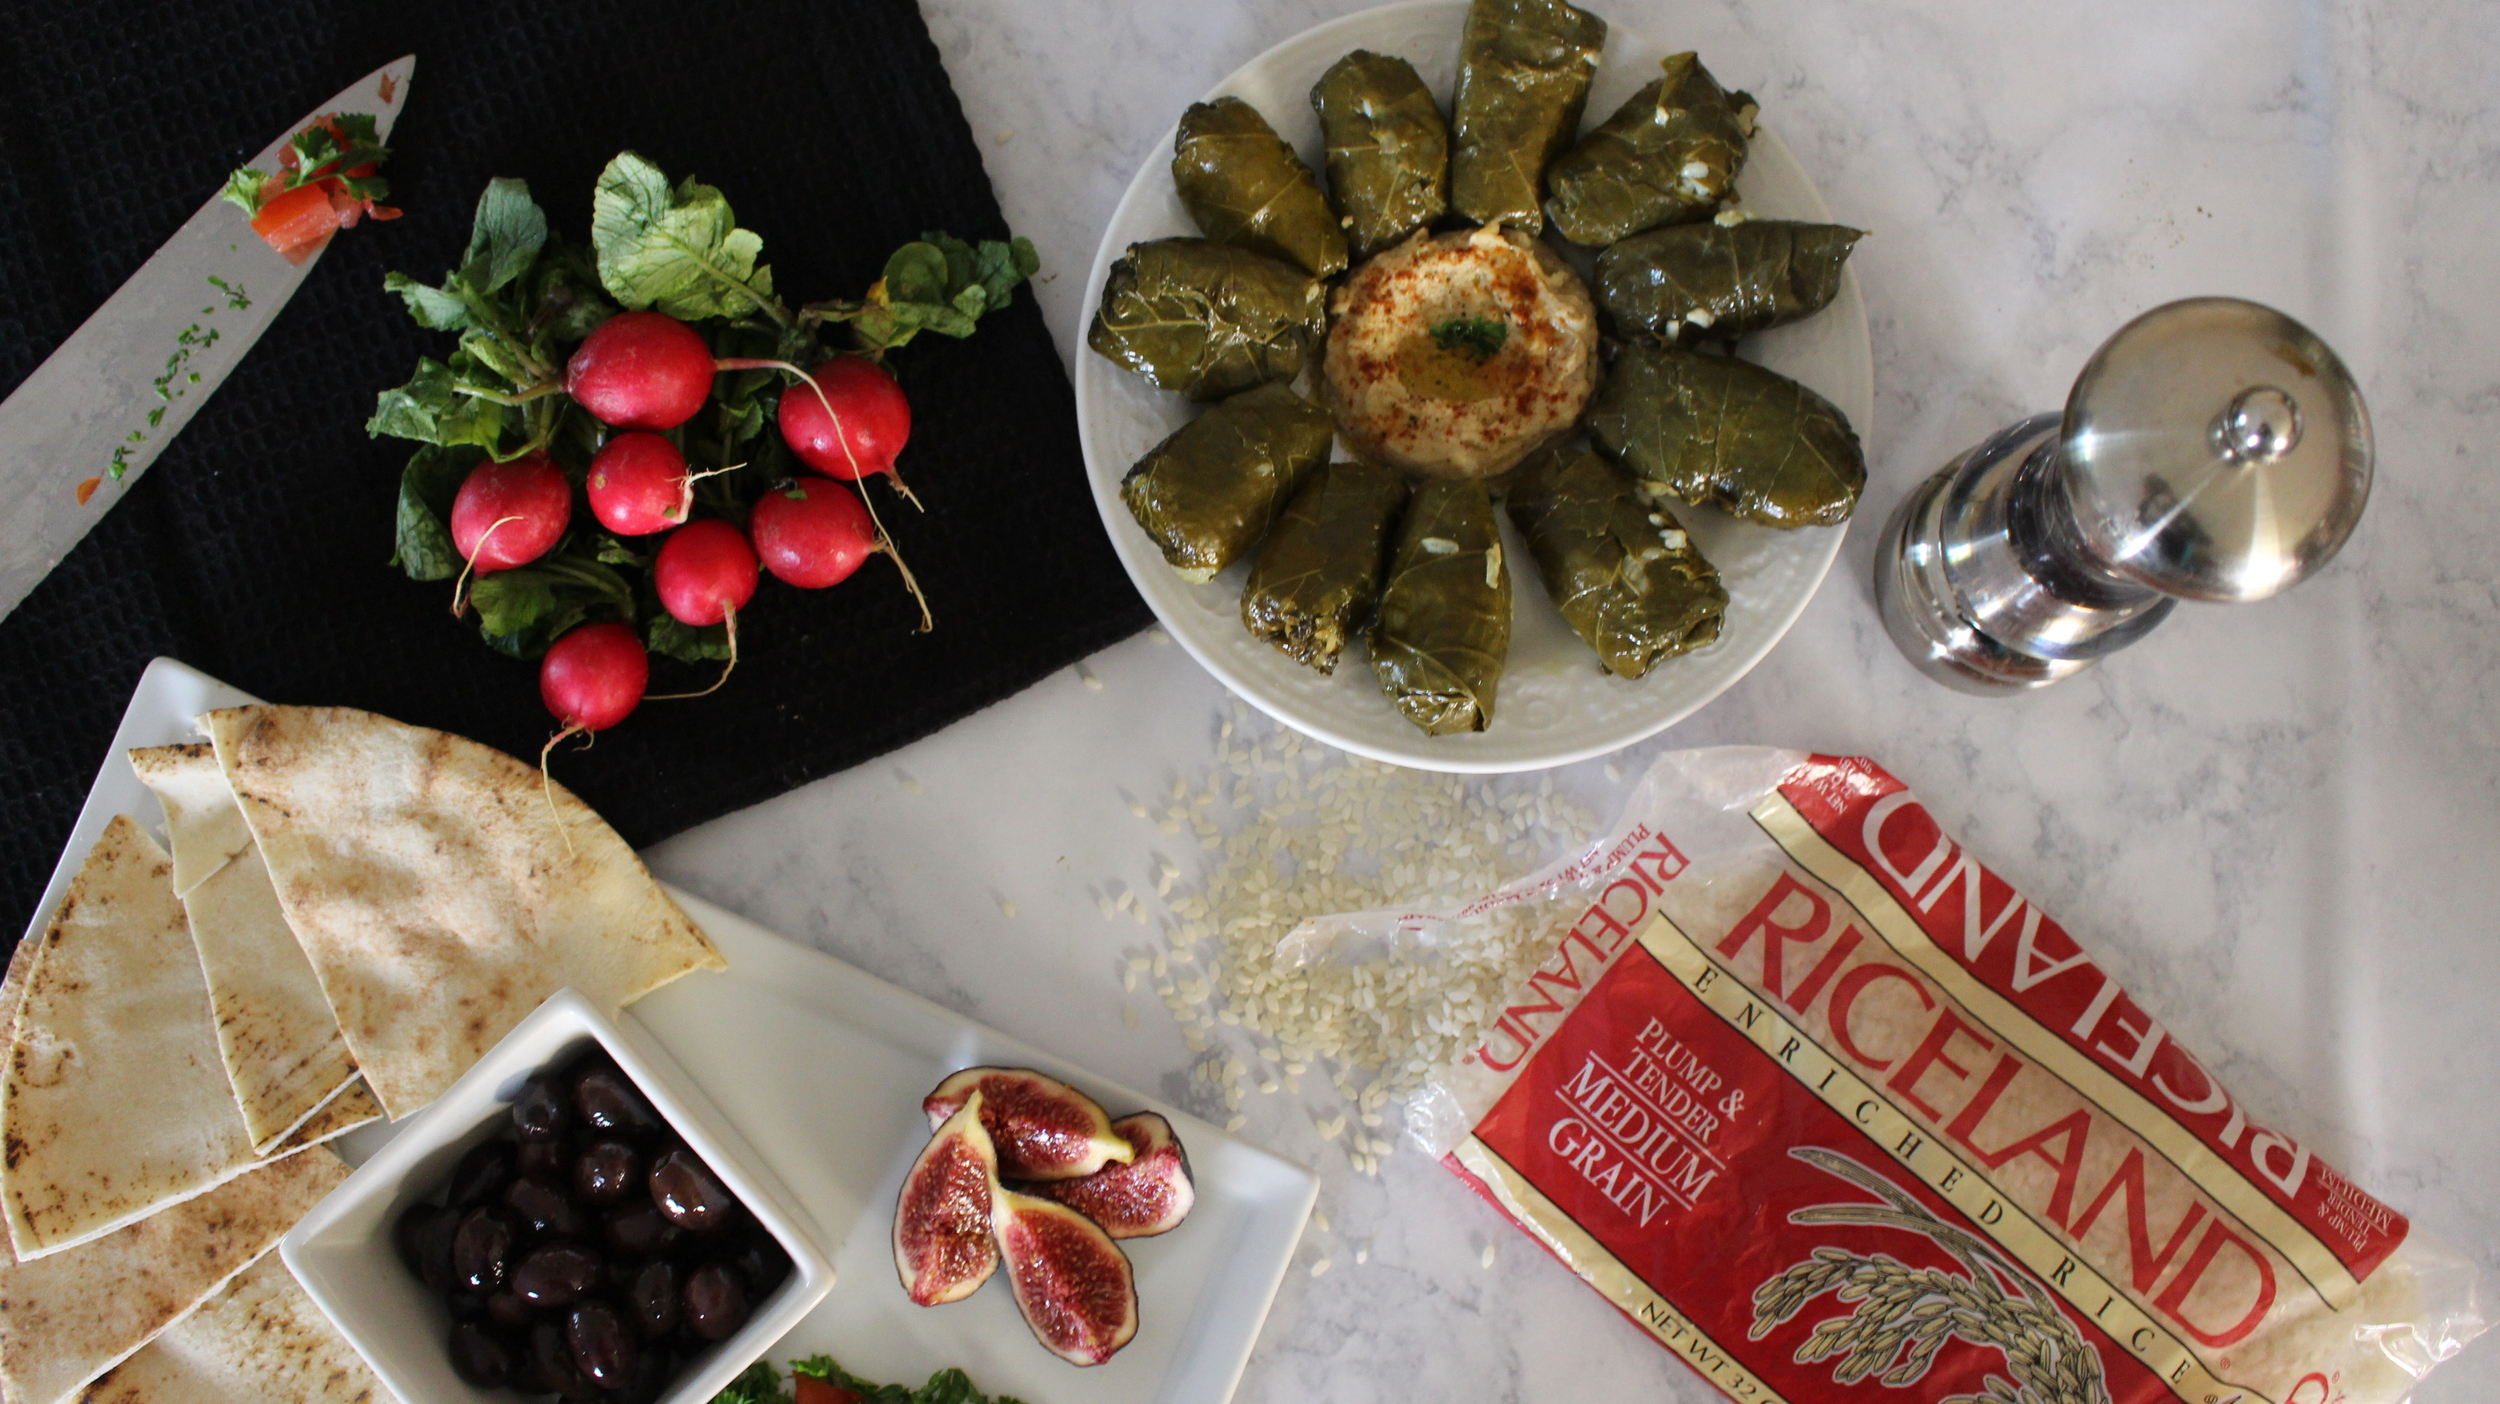 Mediterranean Mezze with Riceland Rice Stuffed Grape Leaves vegan gluten-free Lebanese cuisine Family cooking making memories